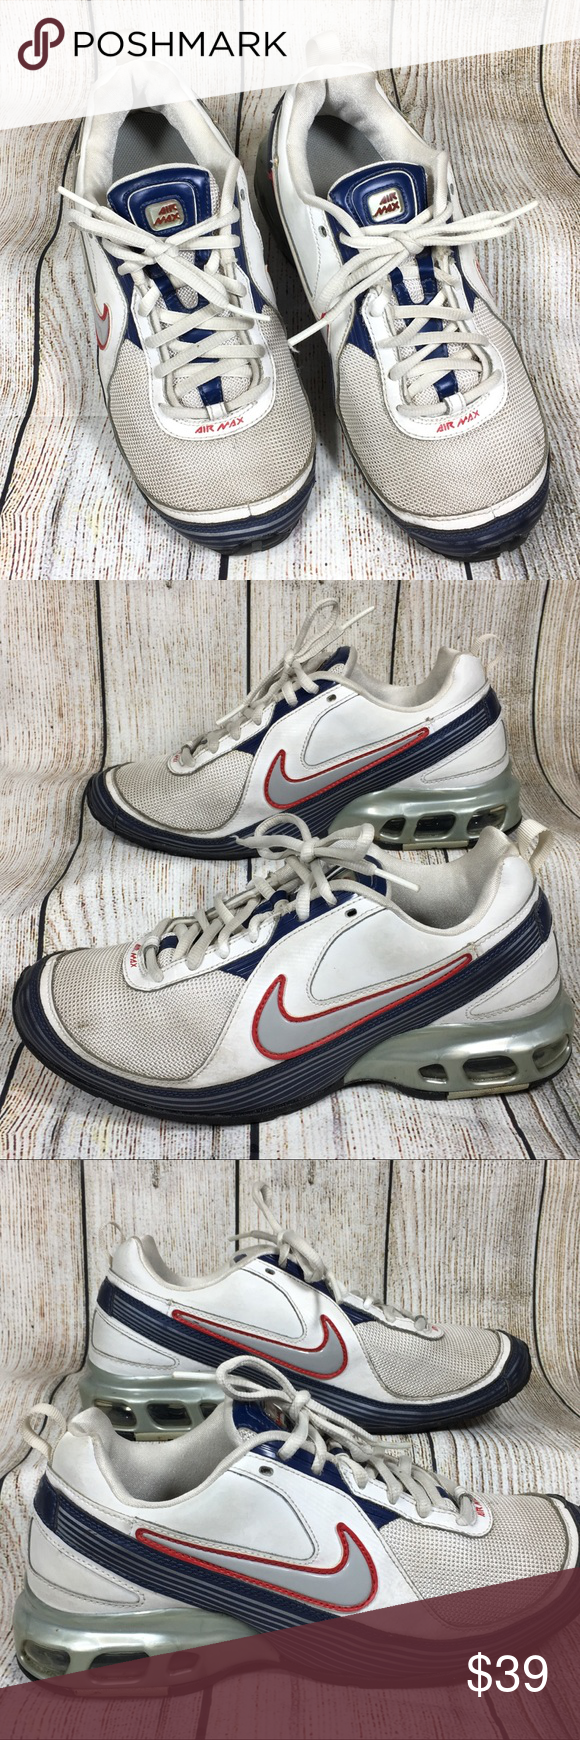 check out dd720 c01d3 Nike Air Burst Premium Navigation Pack 2004, very rare of - Depop;